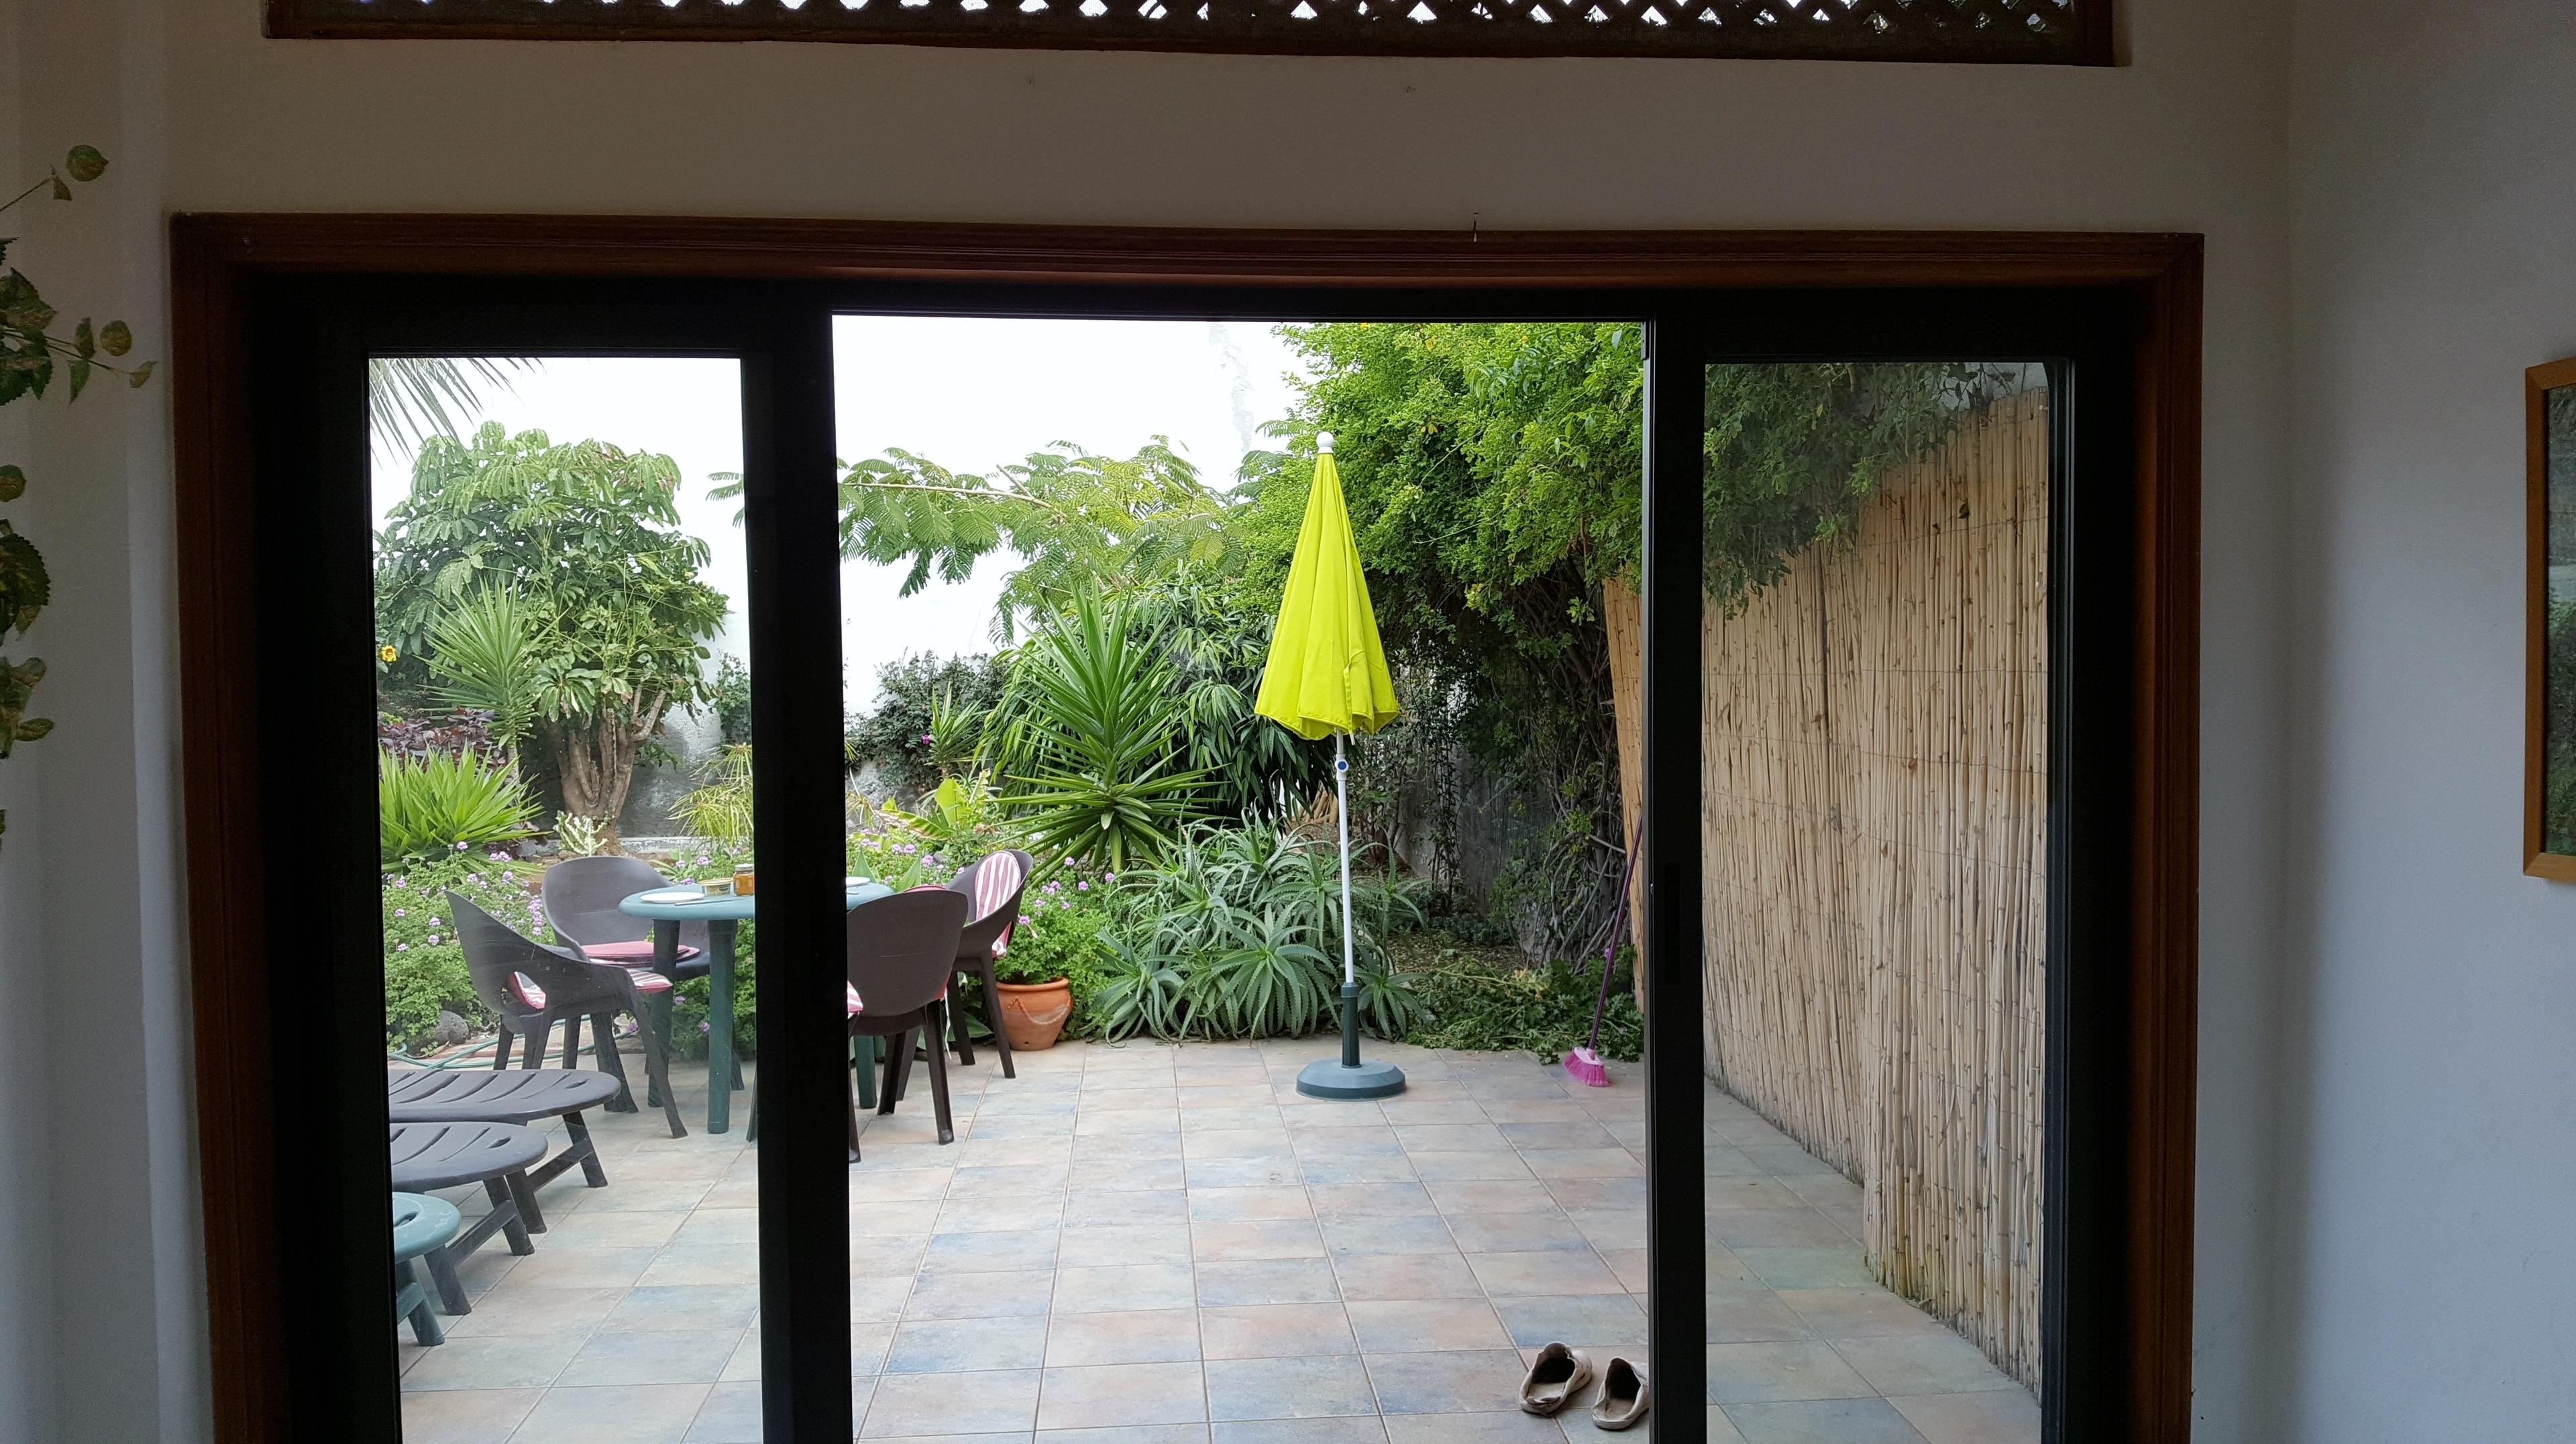 Maison de vacances Casa Chiara (2463888), La Costa, Ténérife, Iles Canaries, Espagne, image 13